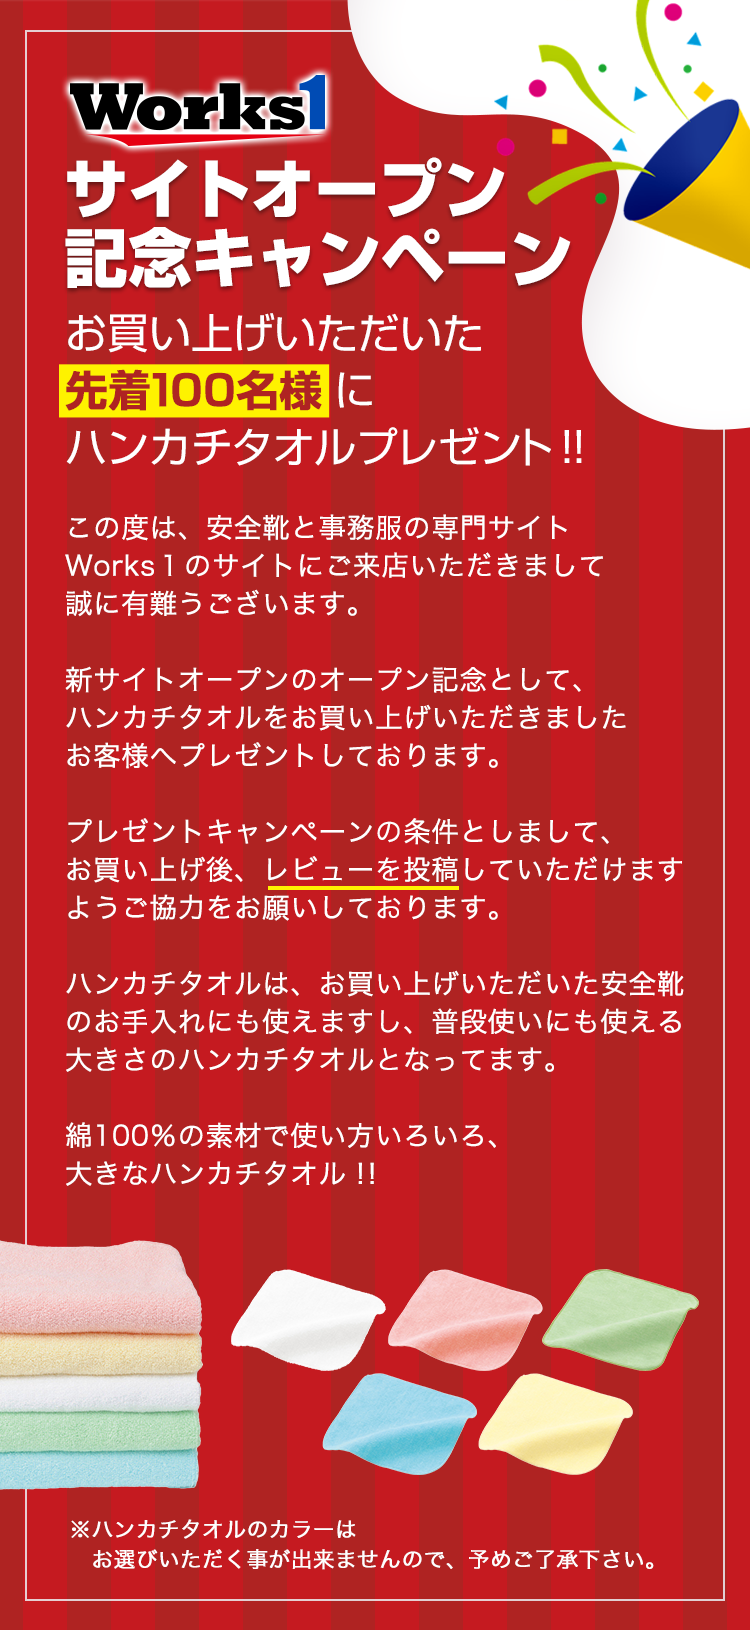 Works1 サイトオープン記念キャンペーン:お買い上げいただいた先着100名様にハンカチタオルプレゼント!!